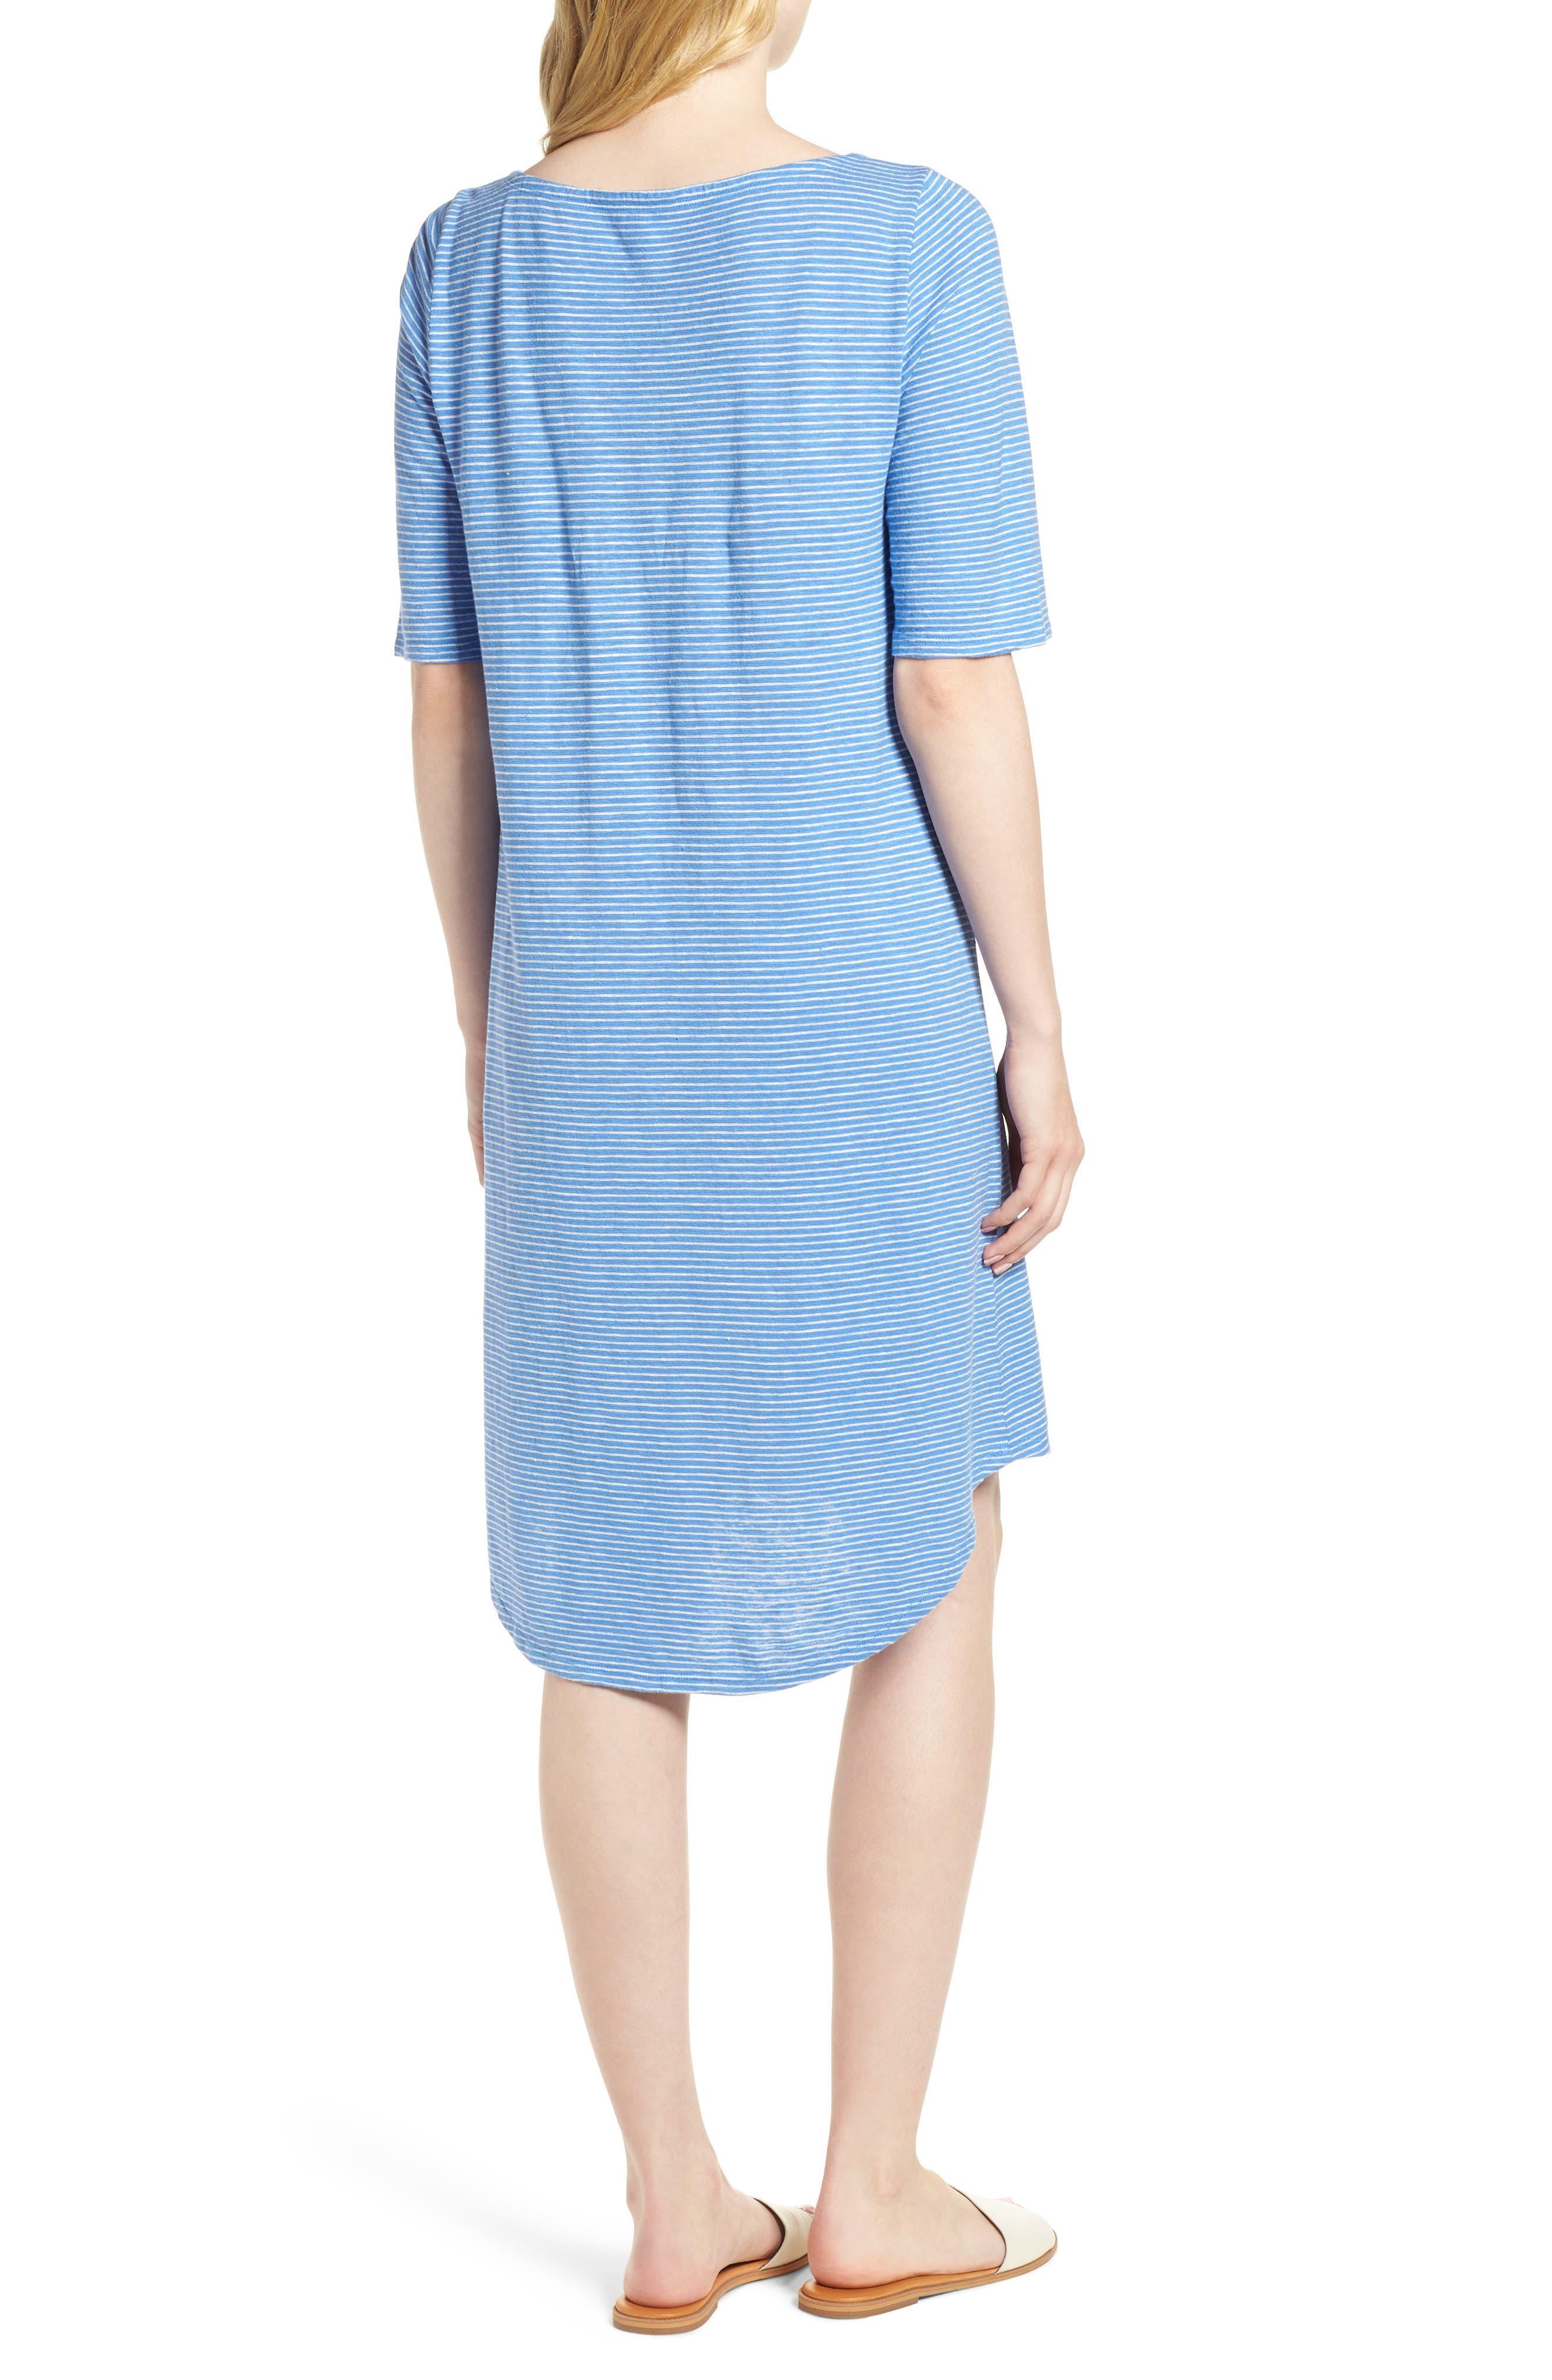 Hemp & Organic Cotton Jersey Dress,                             Alternate thumbnail 2, color,                             Bluebell